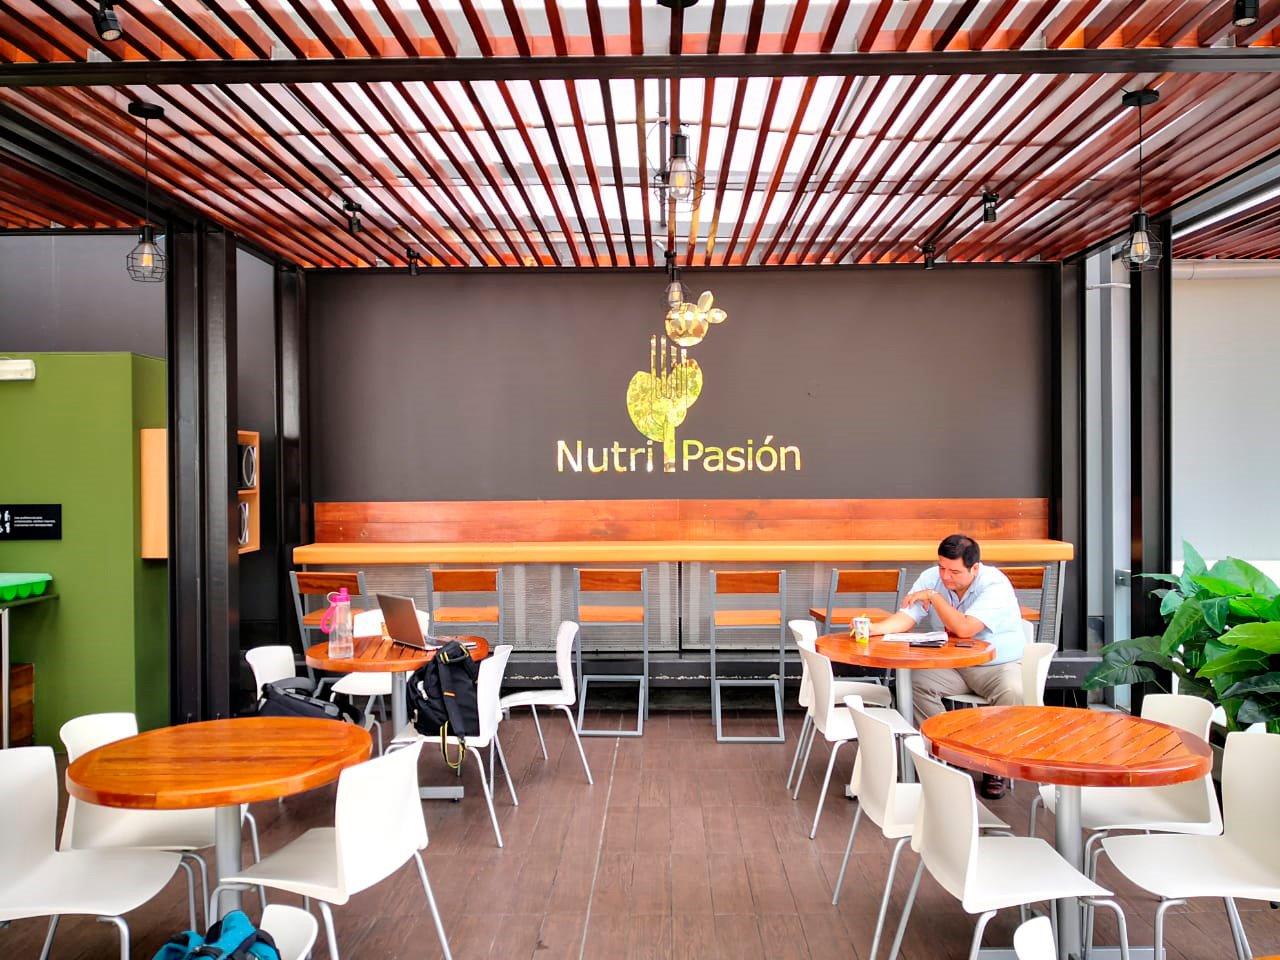 local de upc de Nutripasion - concesionario de alimentos